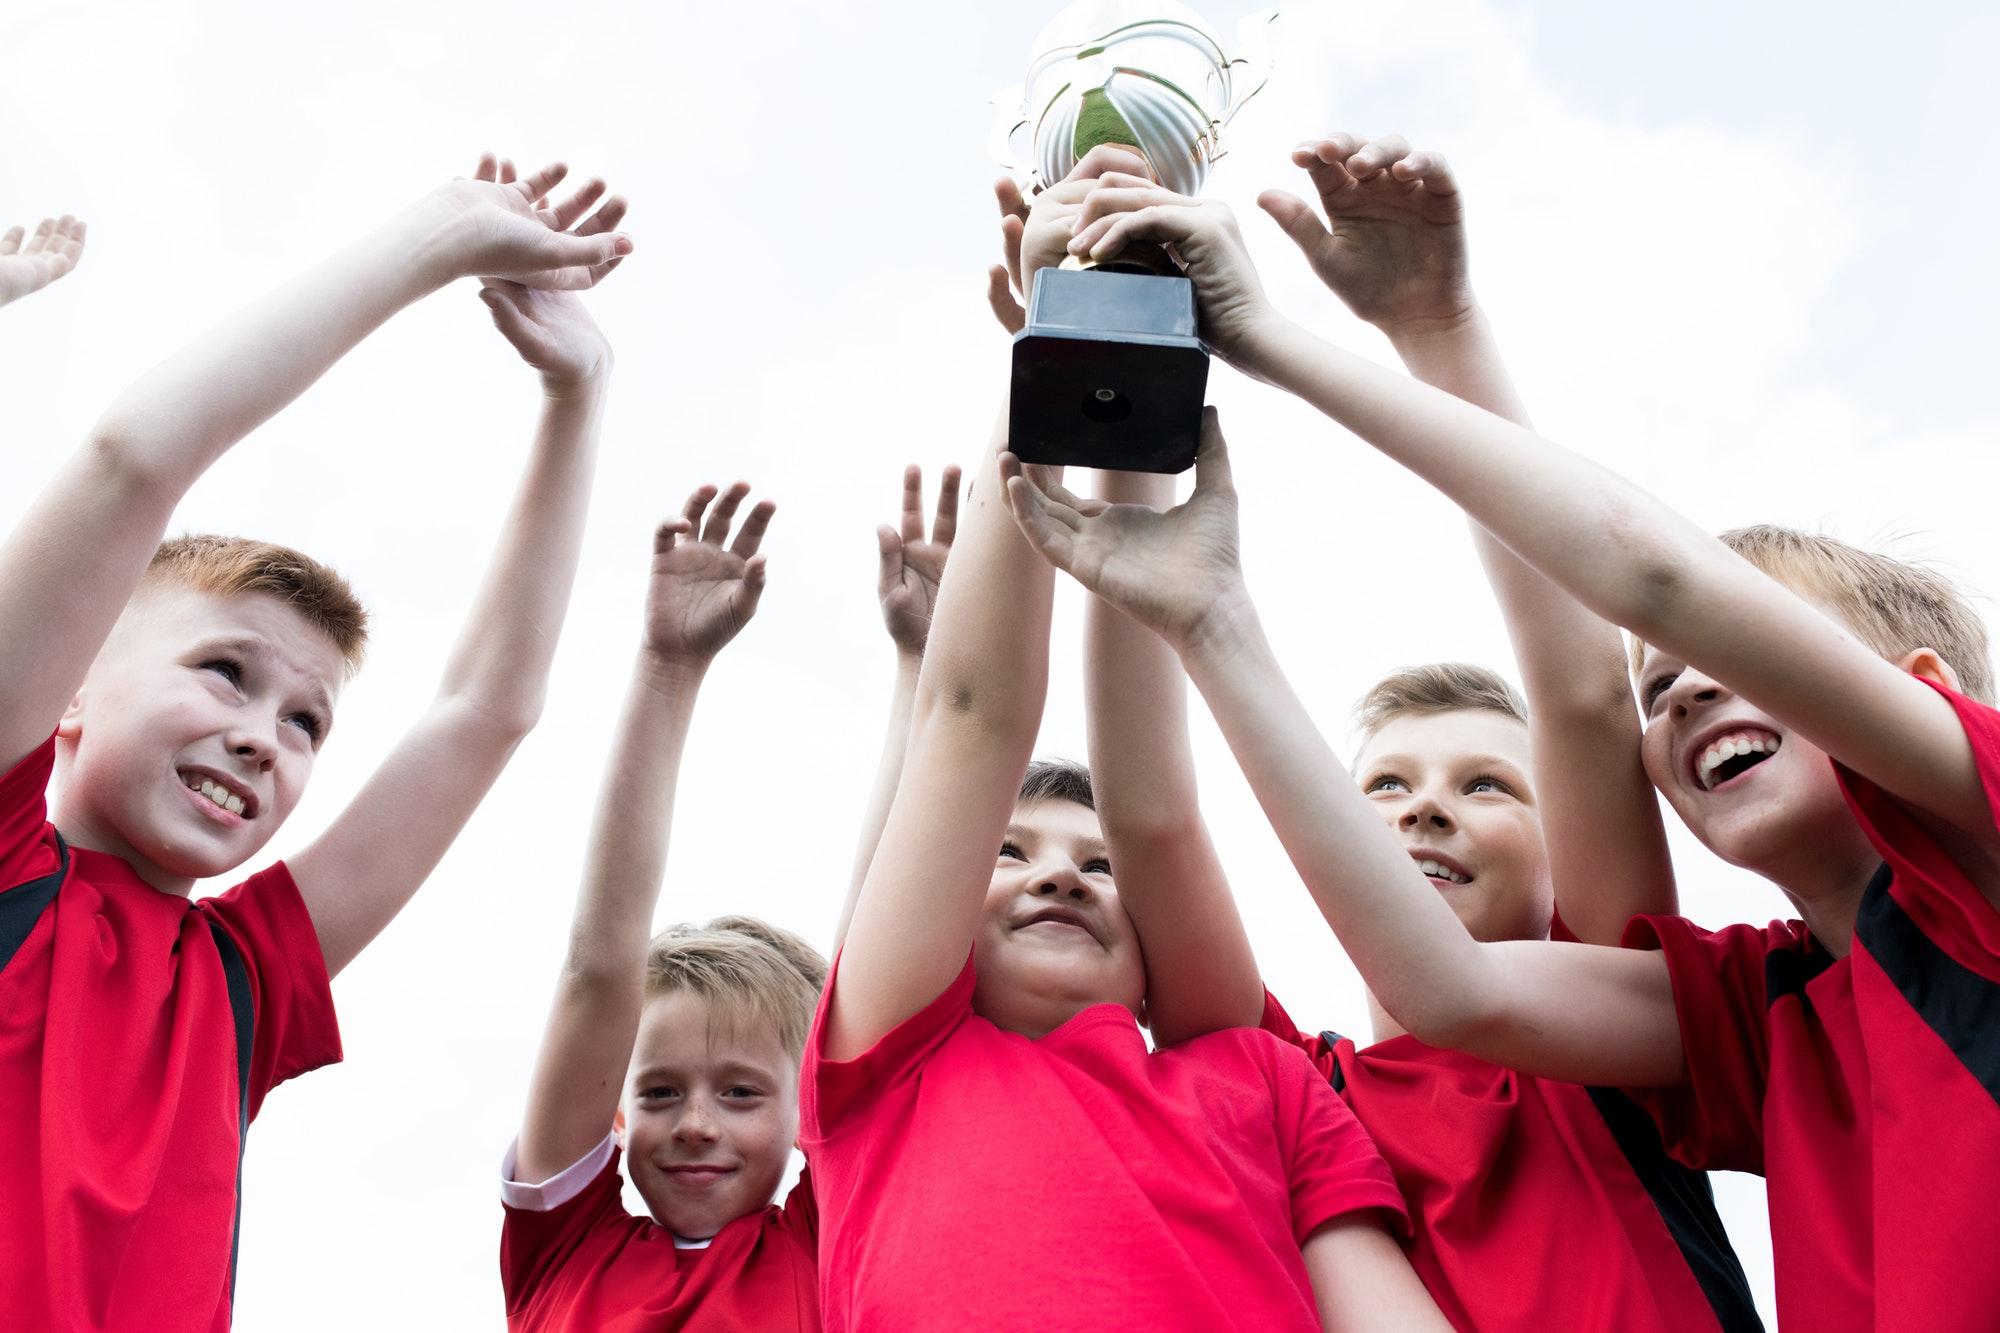 junior-team-holding-trophy.jpg